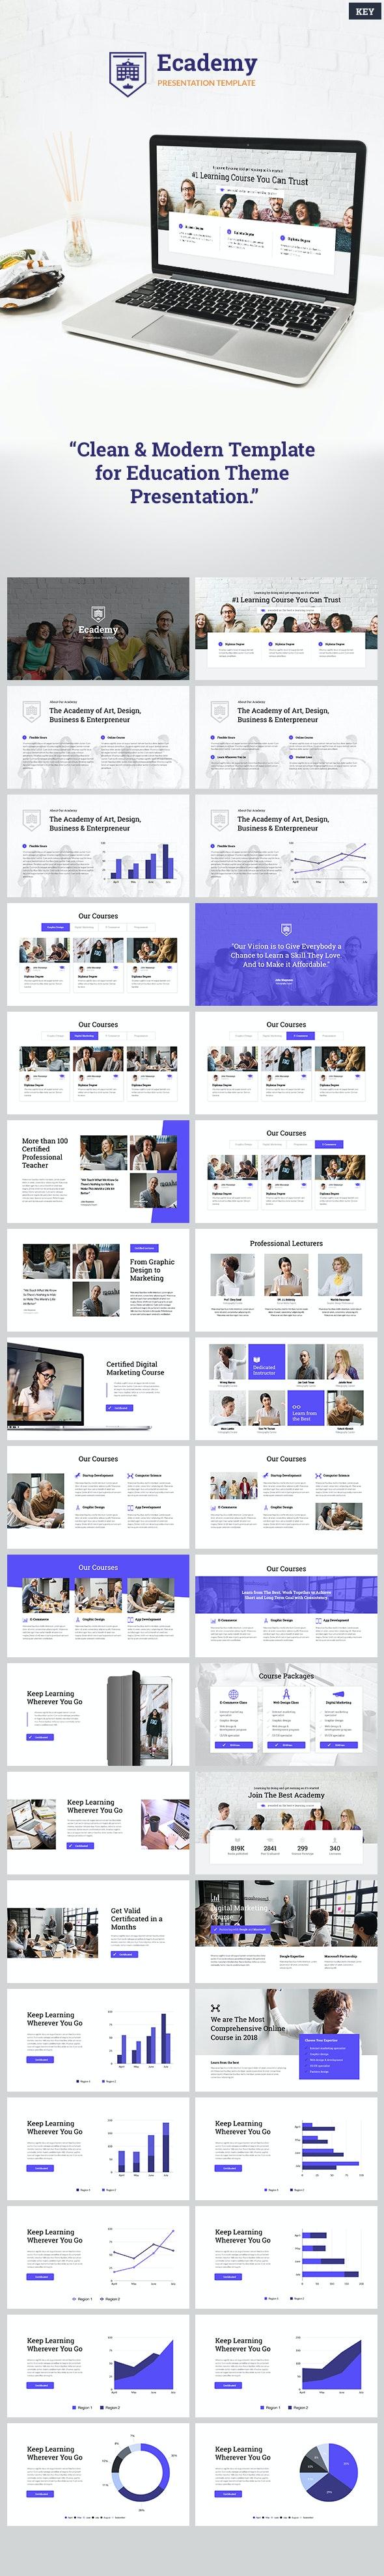 Ecademy - Keynote Template - Keynote Templates Presentation Templates